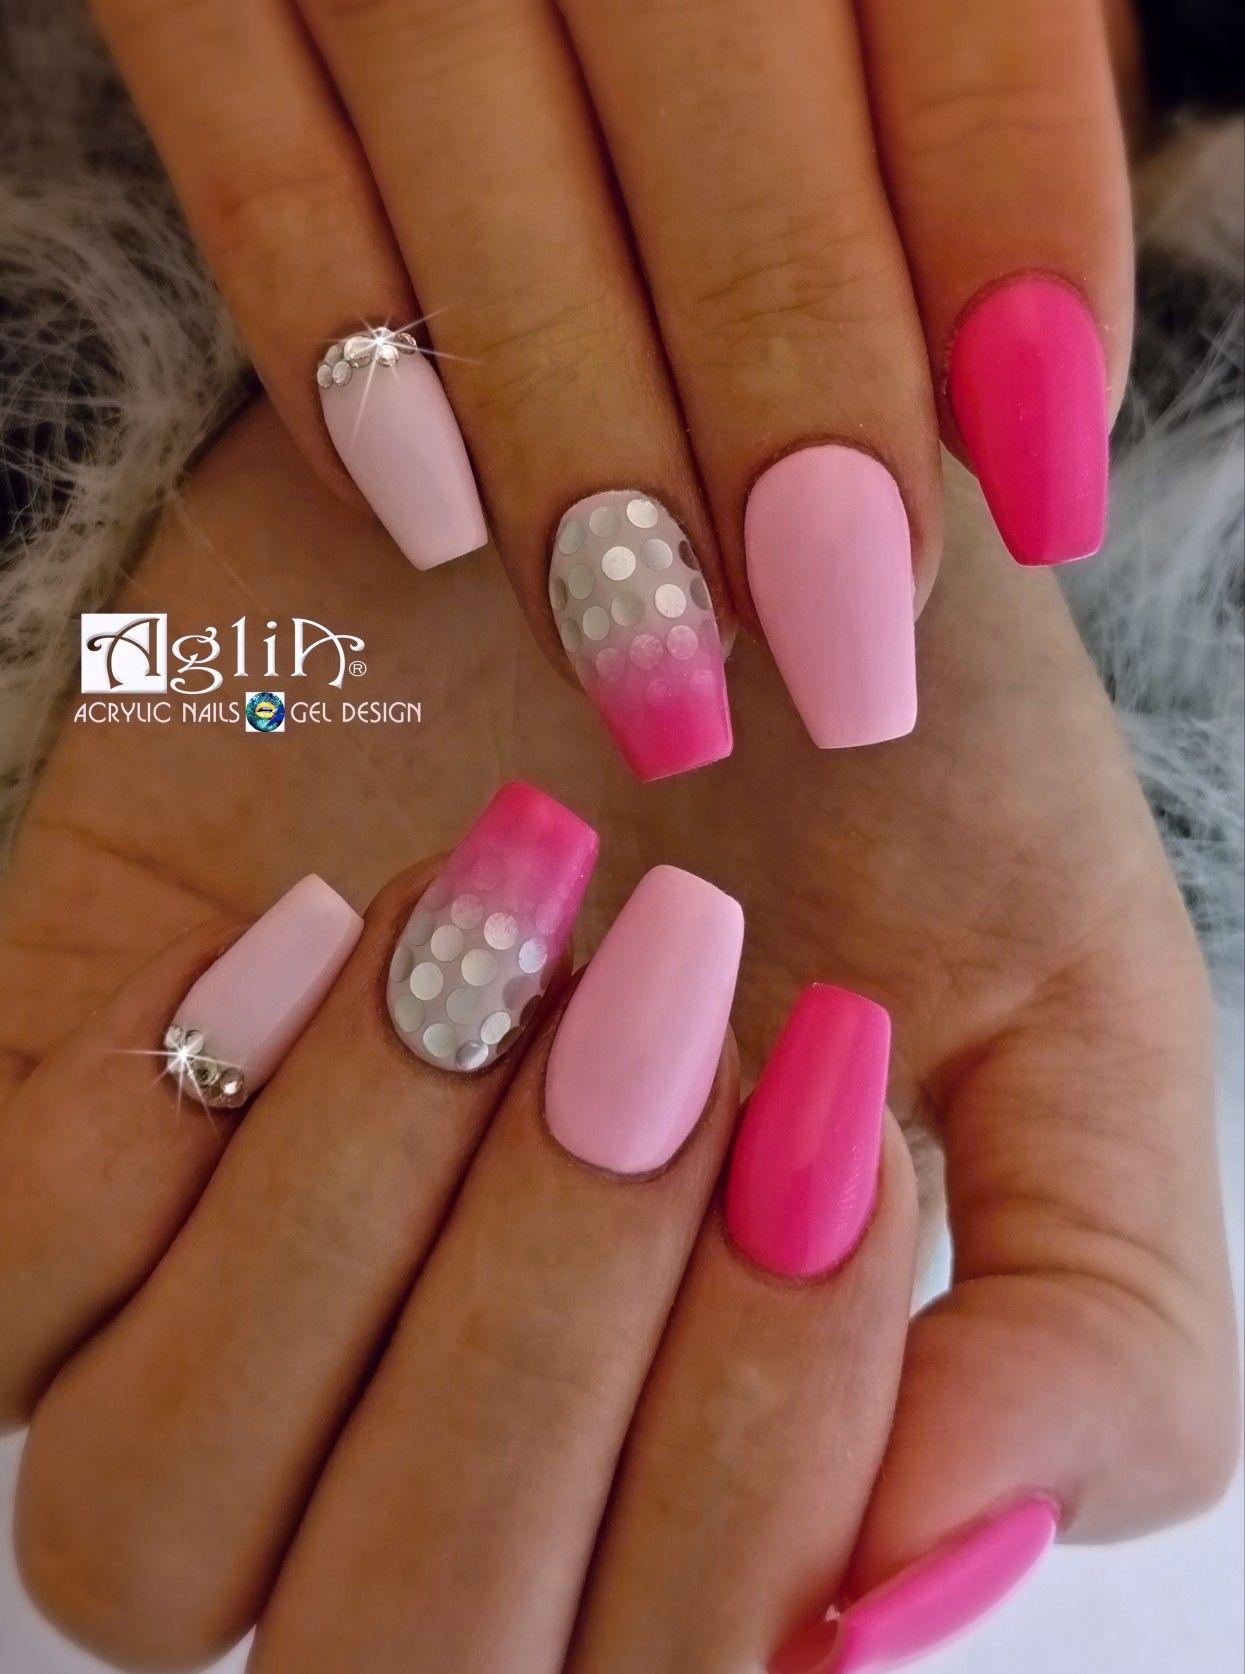 Acrylic Nails Gel Design Nail Art Nehty Ruzova